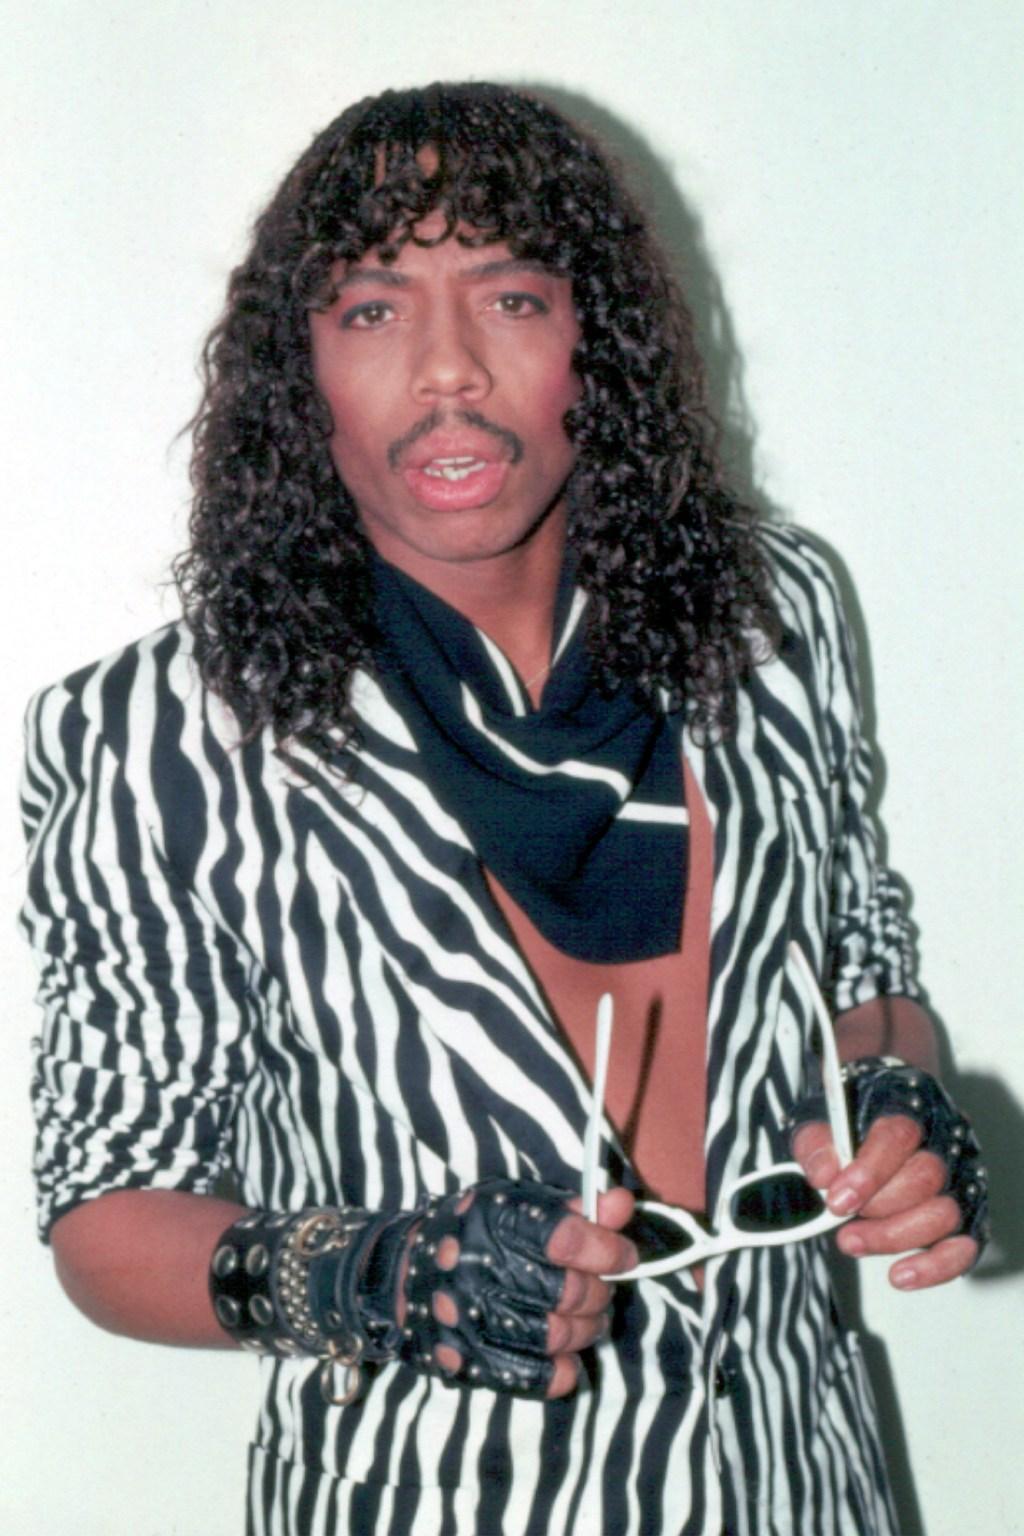 New Rick James doc reveals how penis-wielding coke binge helped Lionel Richie